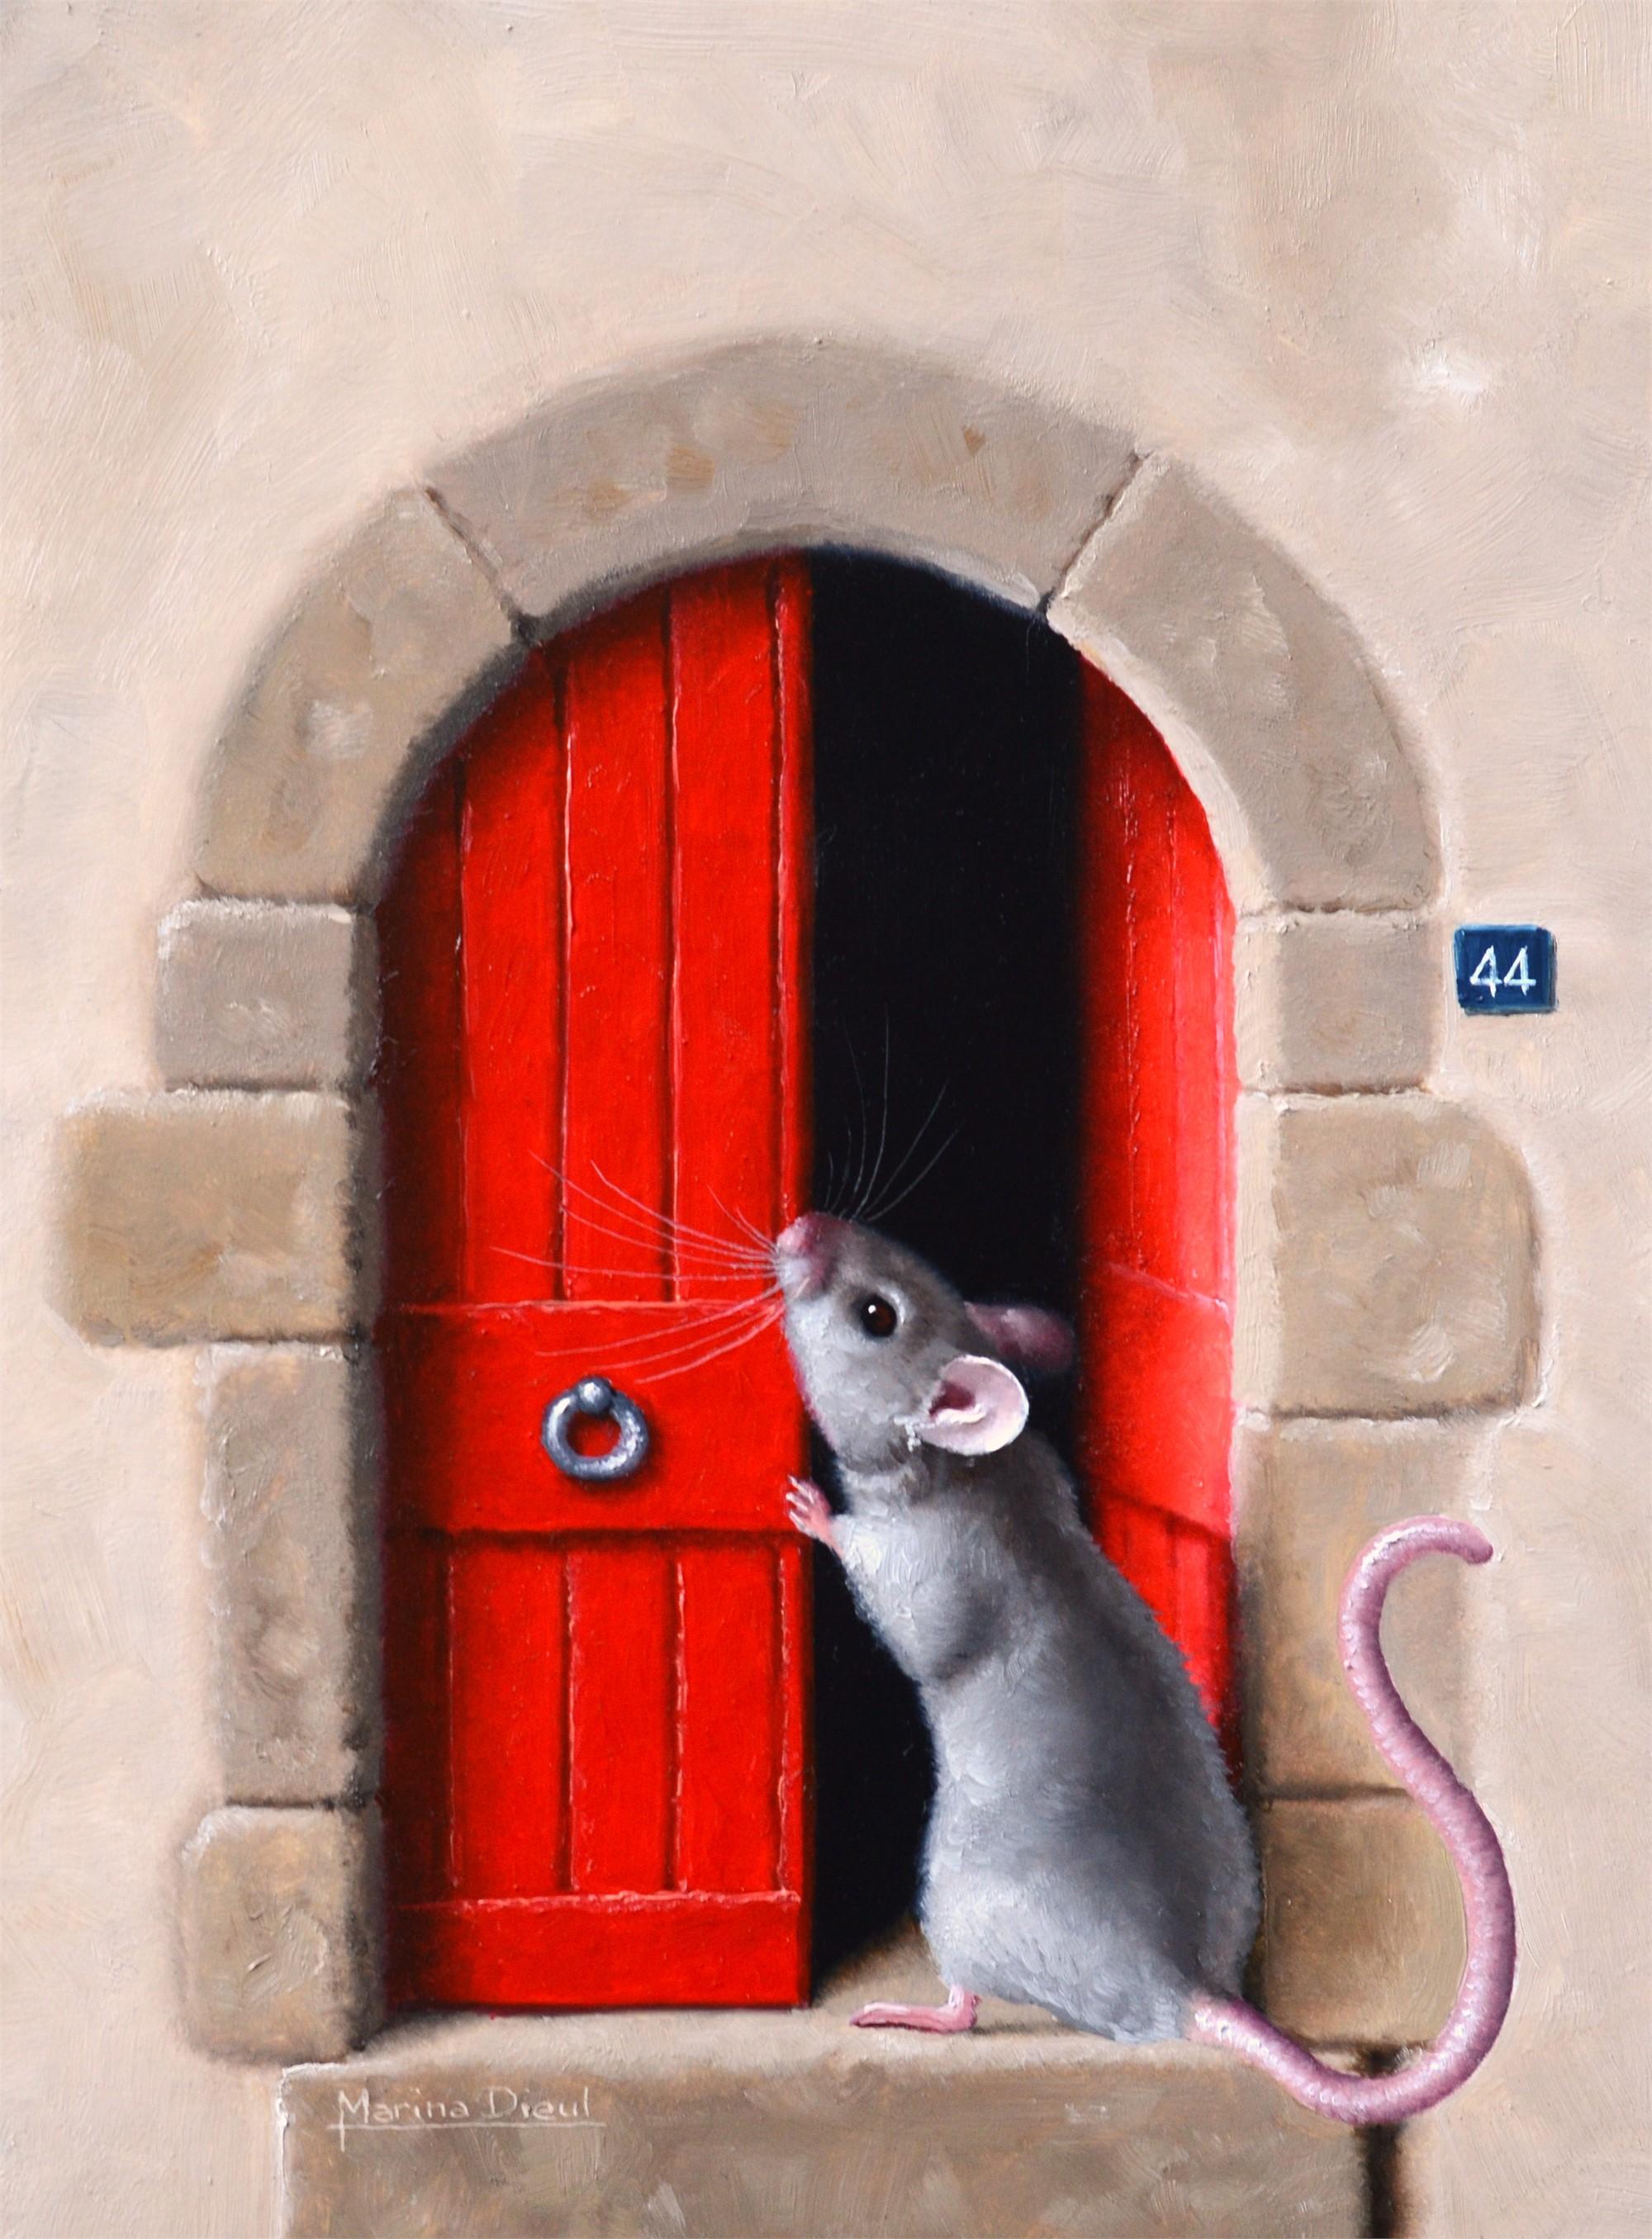 Numero 44 by Marina Dieul